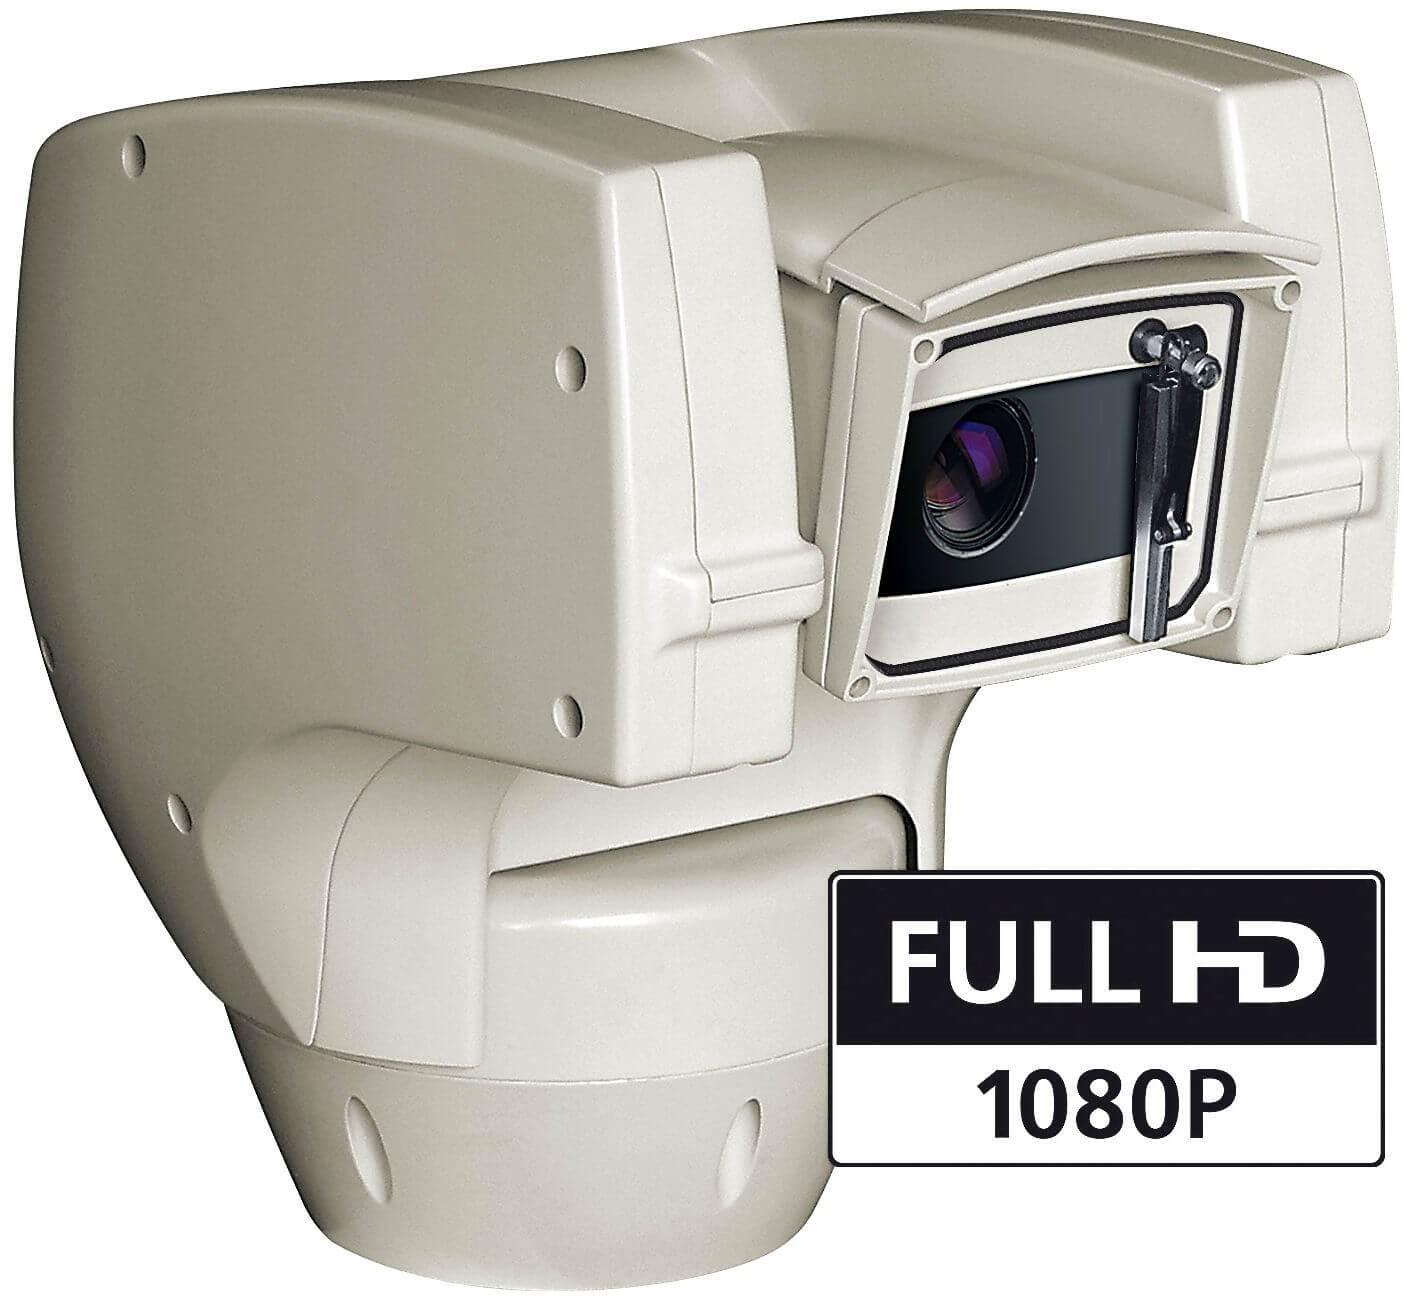 Videotec UCHD21WAZ00B Ulisse Compact Delux